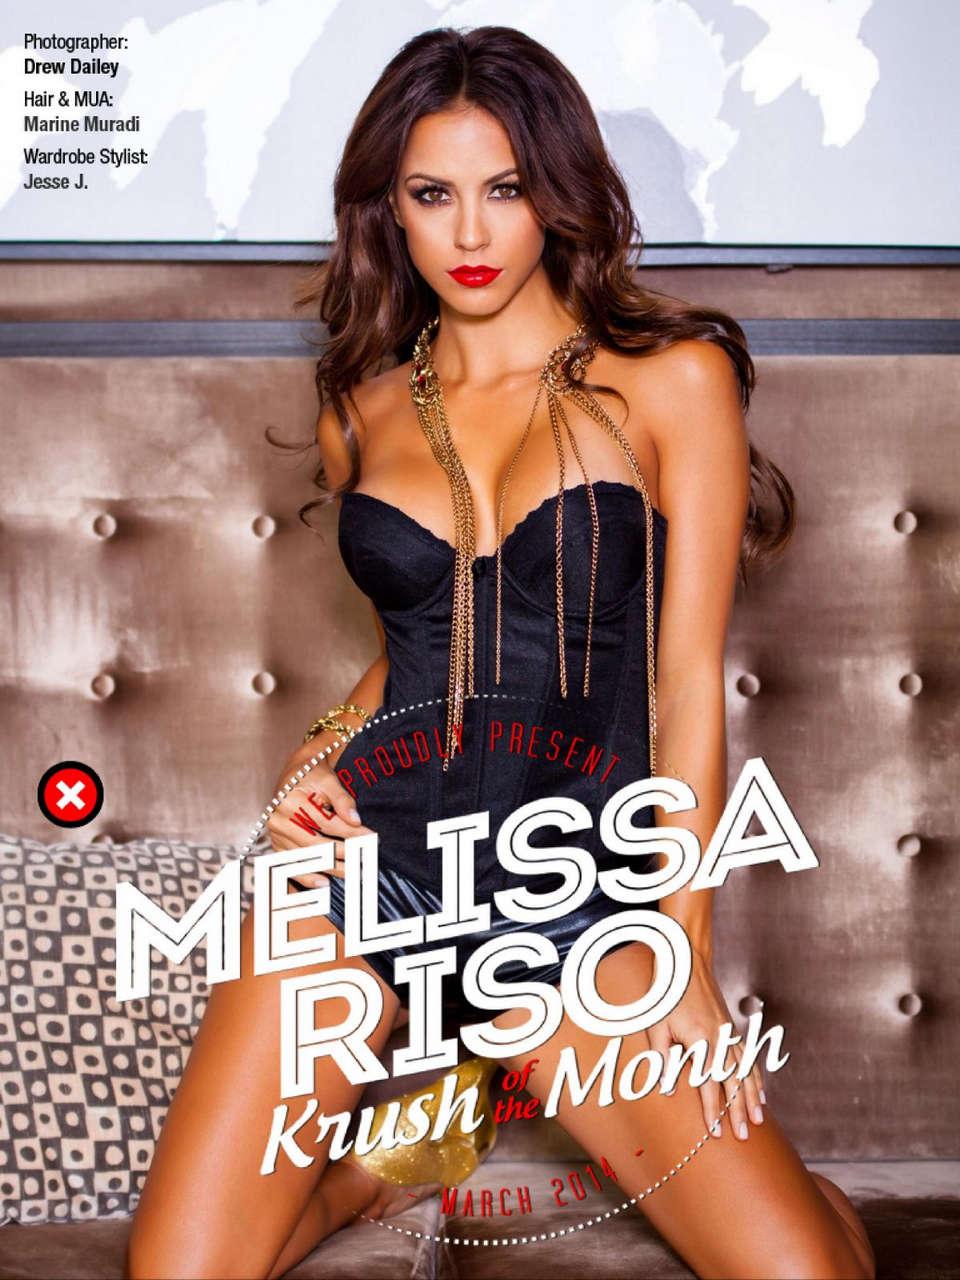 Melissa Rio Kandy Magazine March 2014 Issue